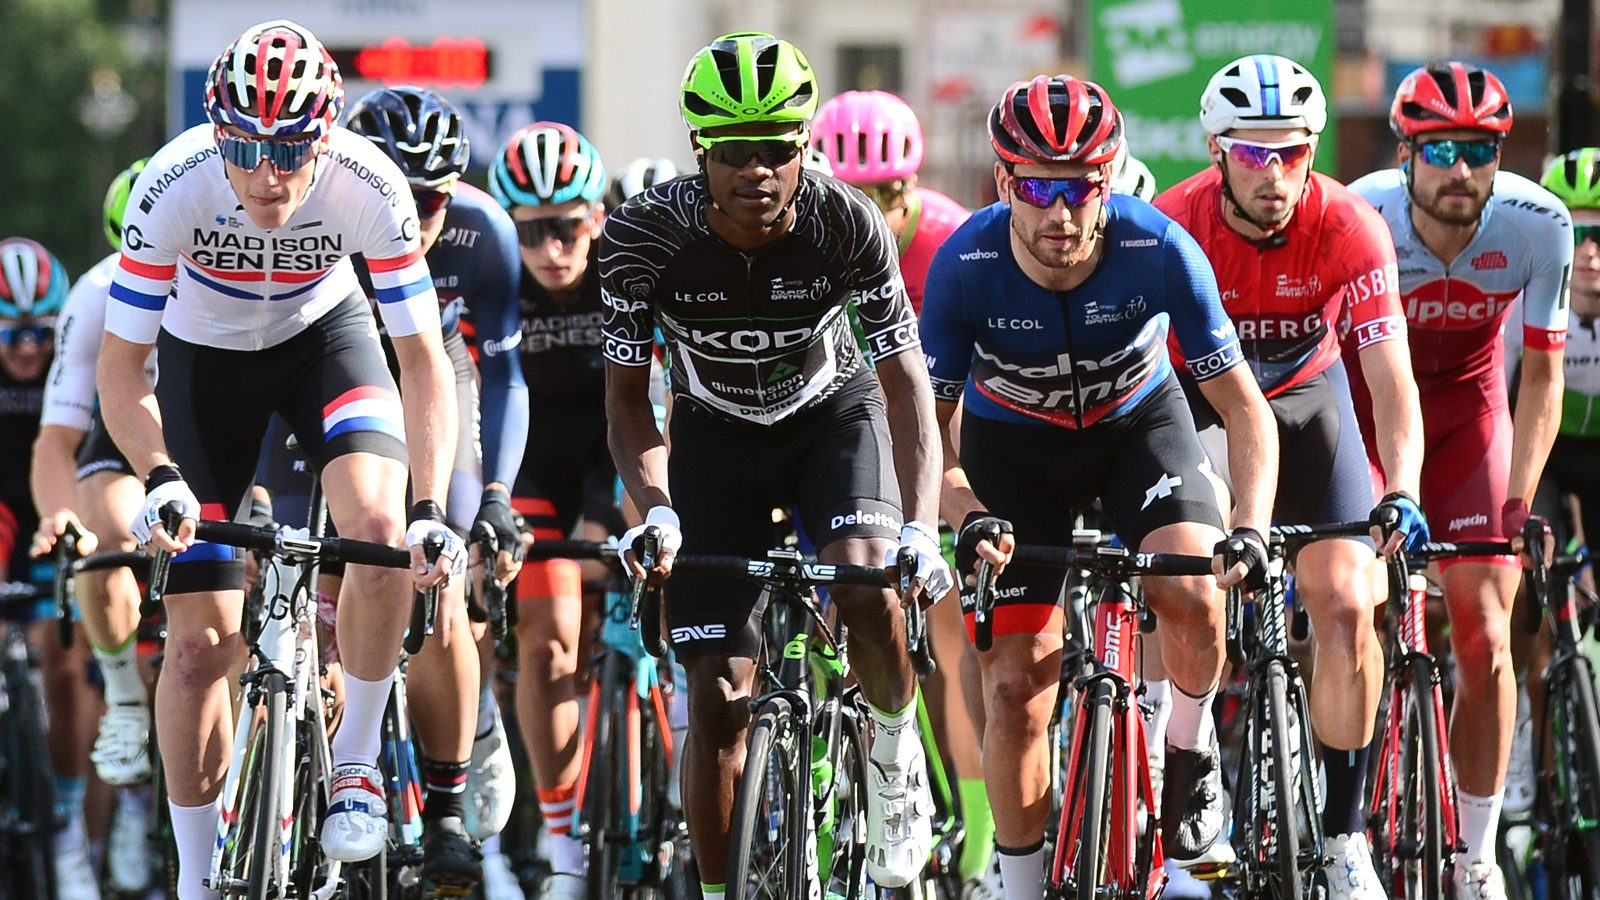 Tour of Britain jerseys